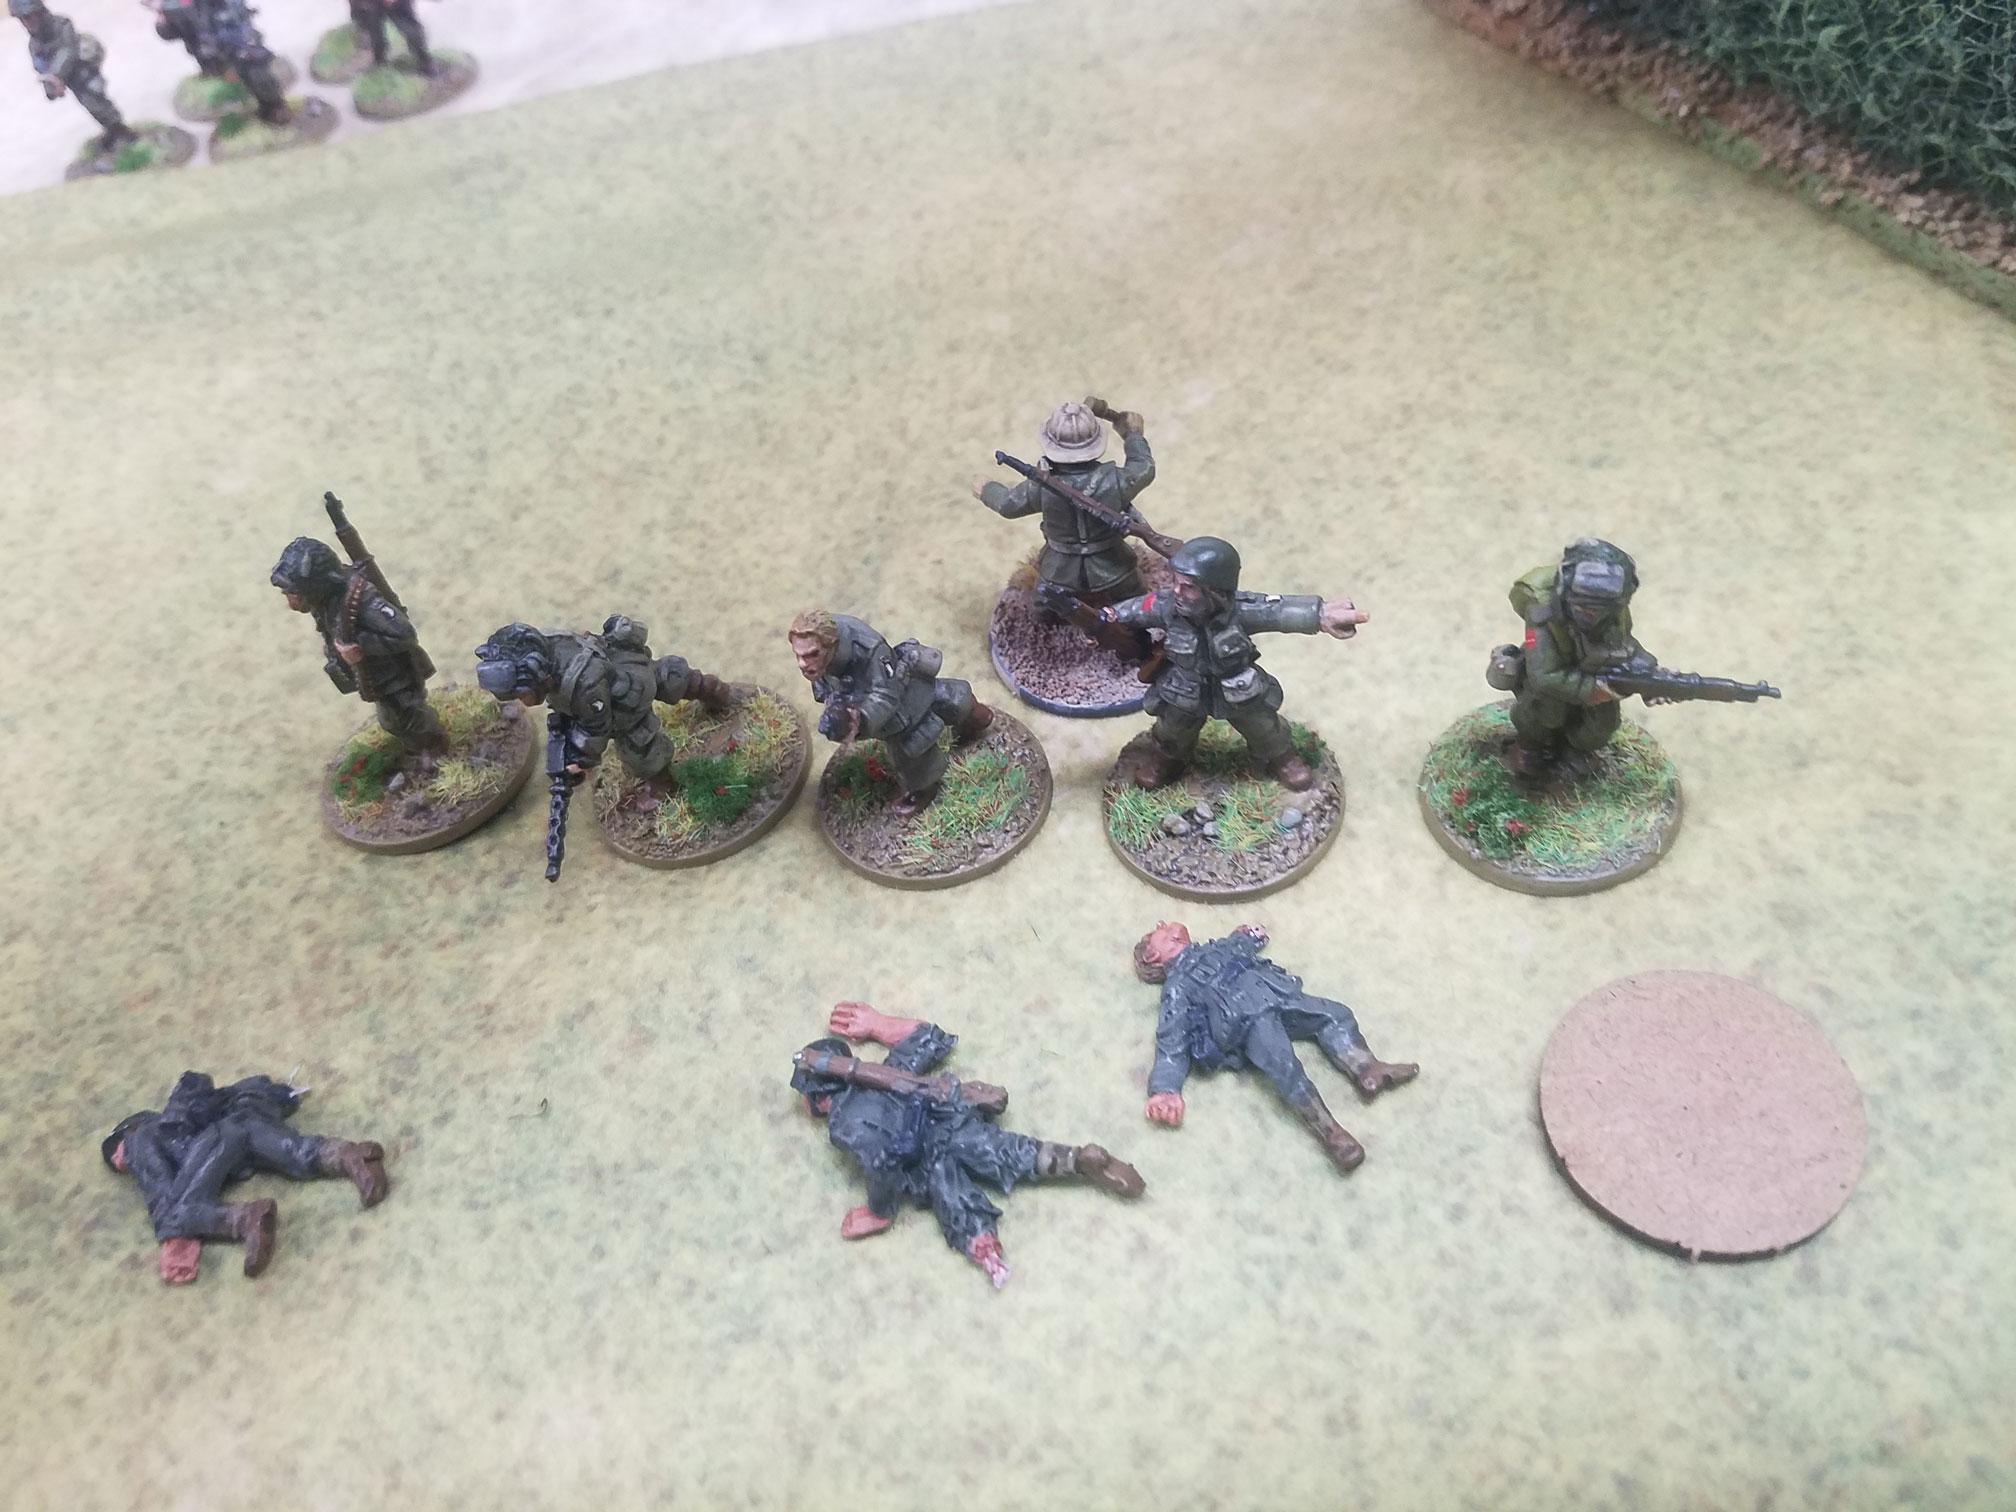 Lawn Darts versus 2nd Panzer Div in a fierce infantry engagement